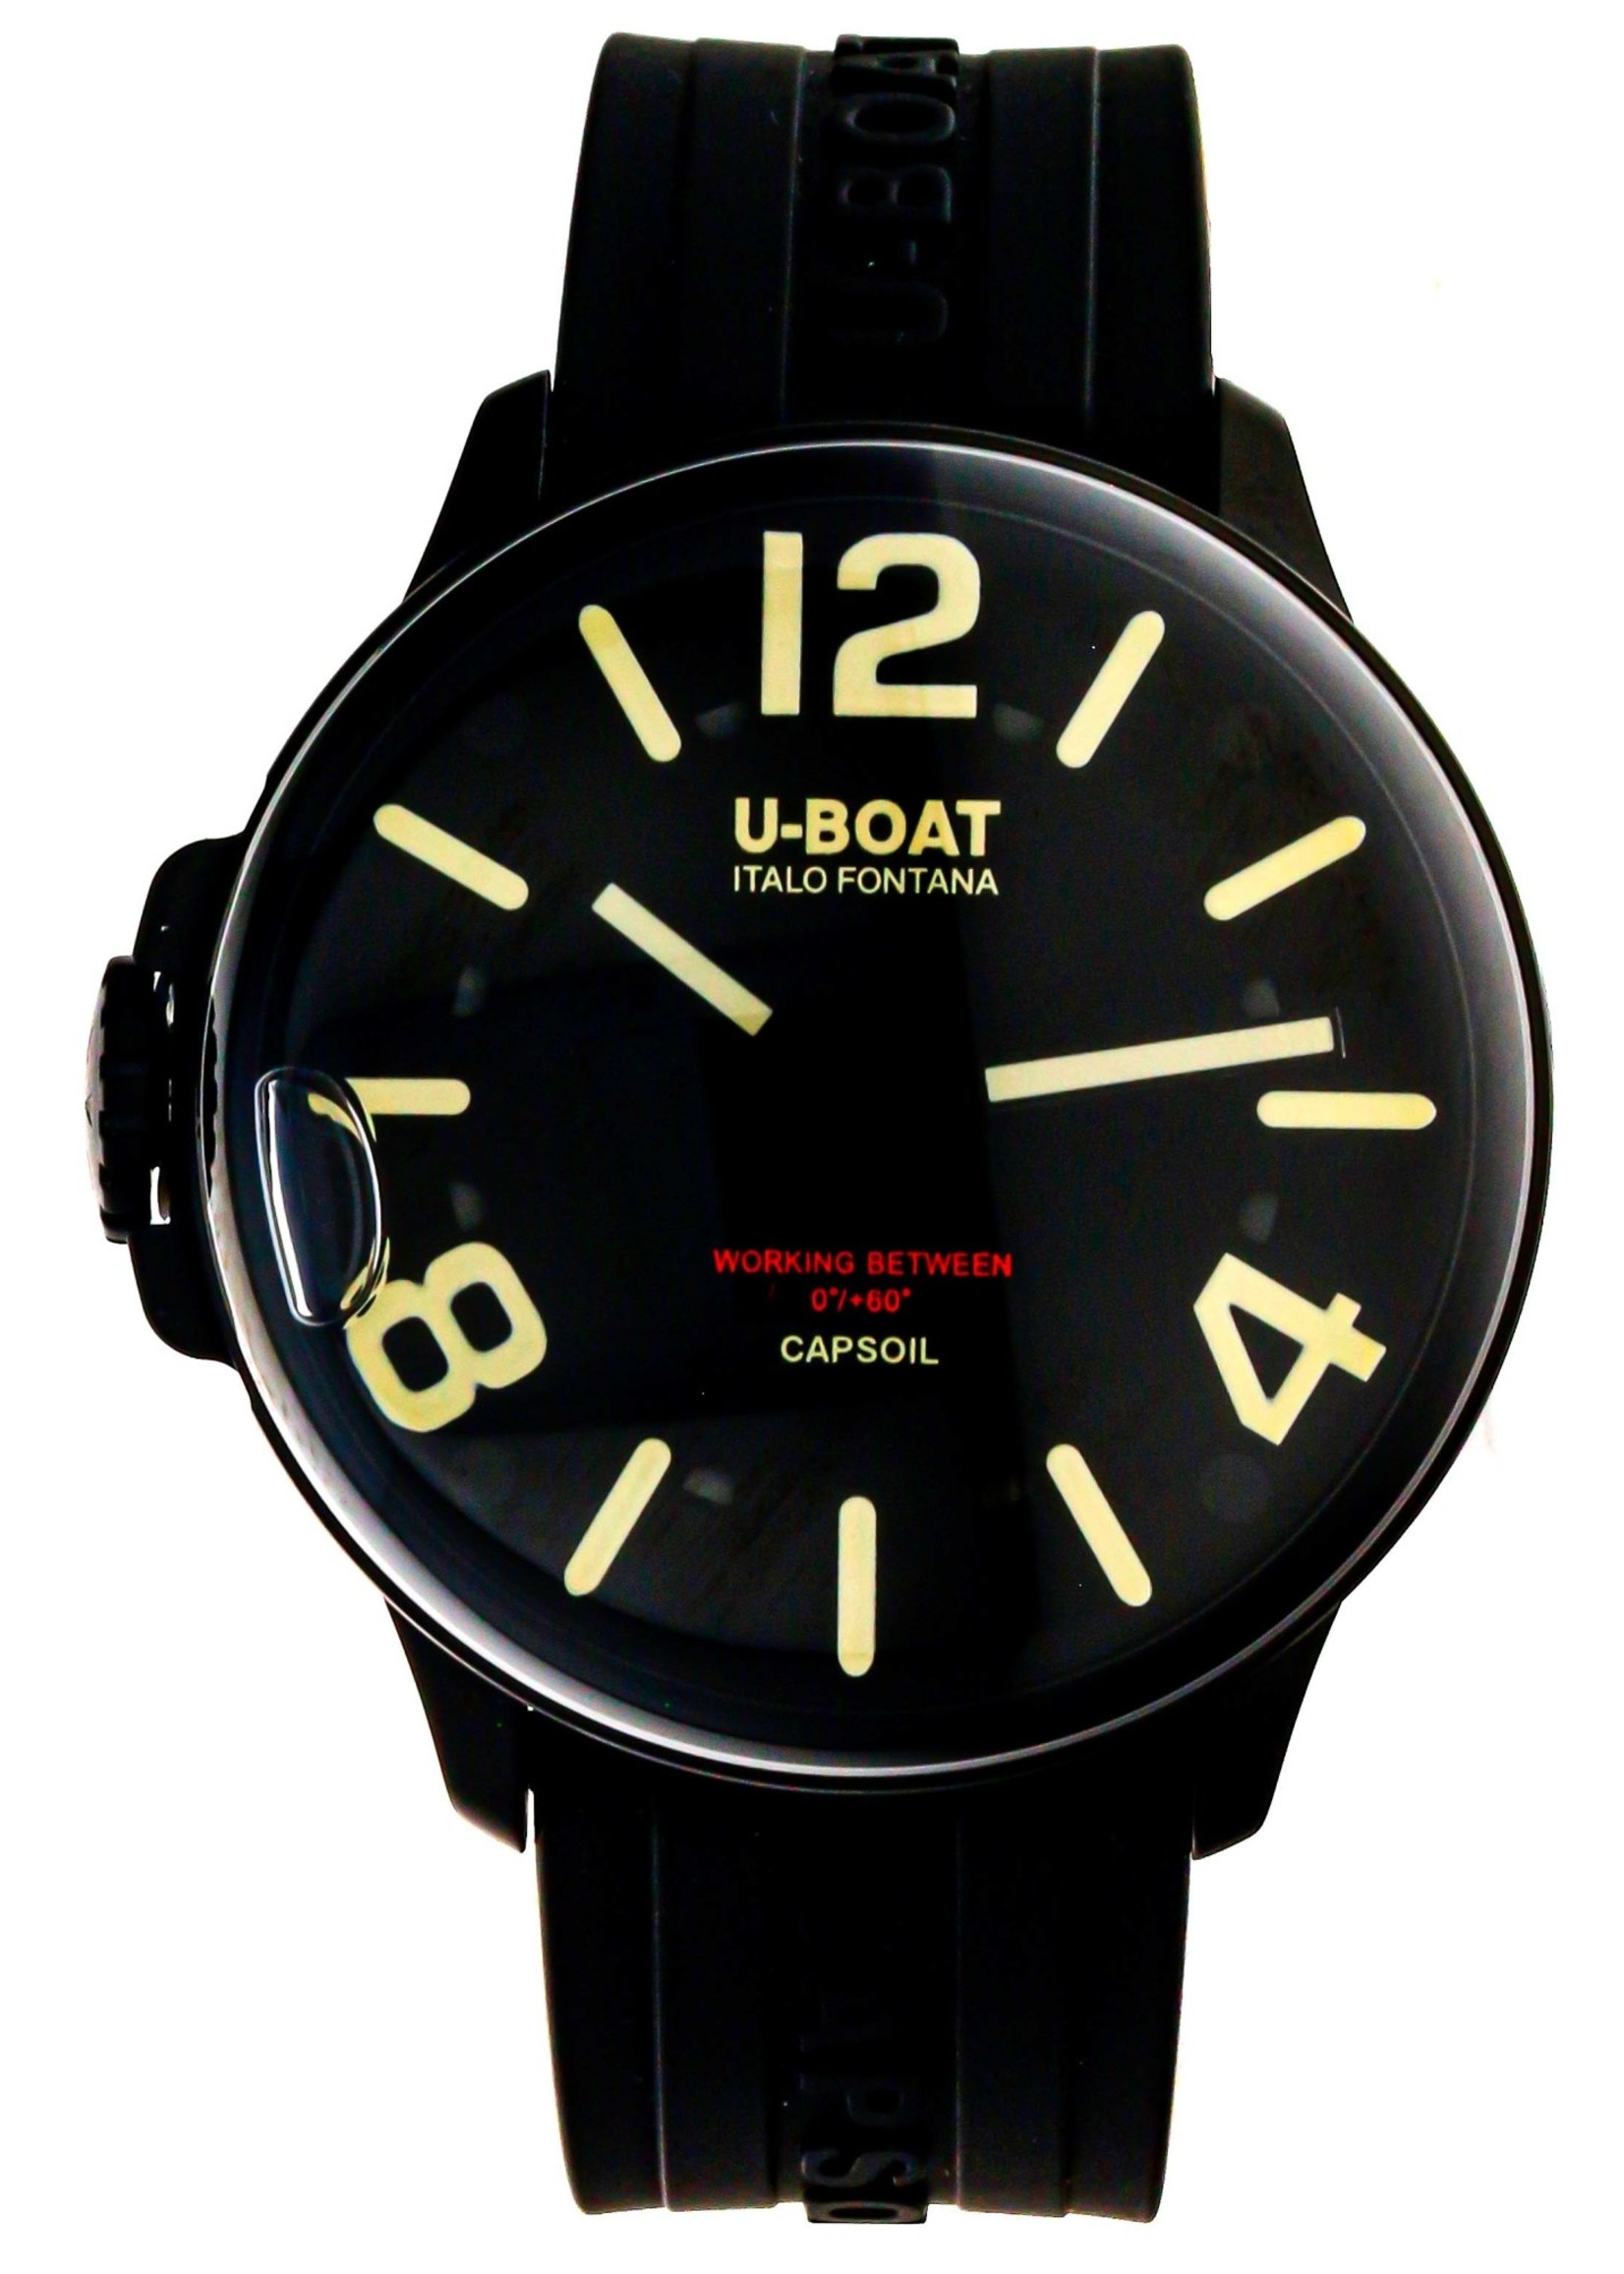 U-BOAT U-BOAT CAPSOIL #8108/A DLC (2020 B+P)